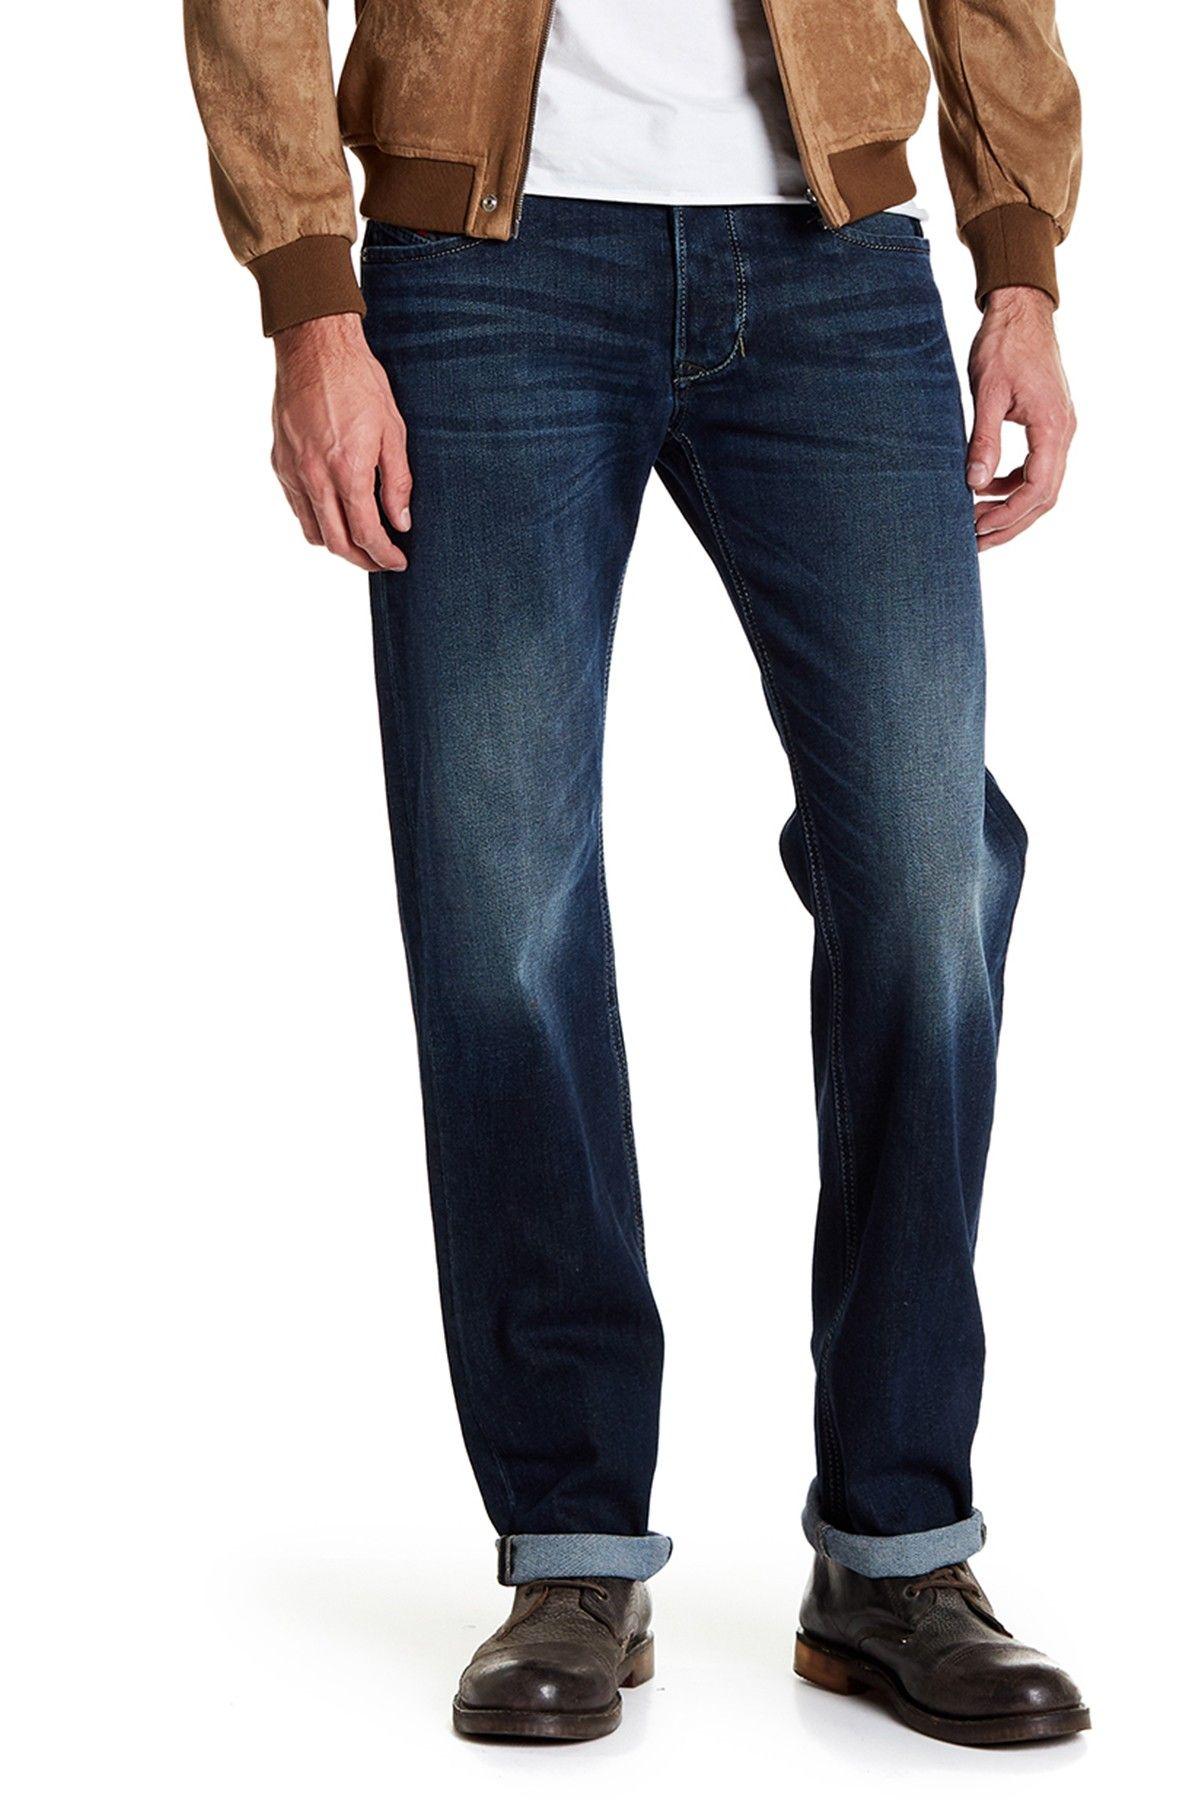 ebbc3b73 Diesel | Larkee Straight Leg Jeans - 34